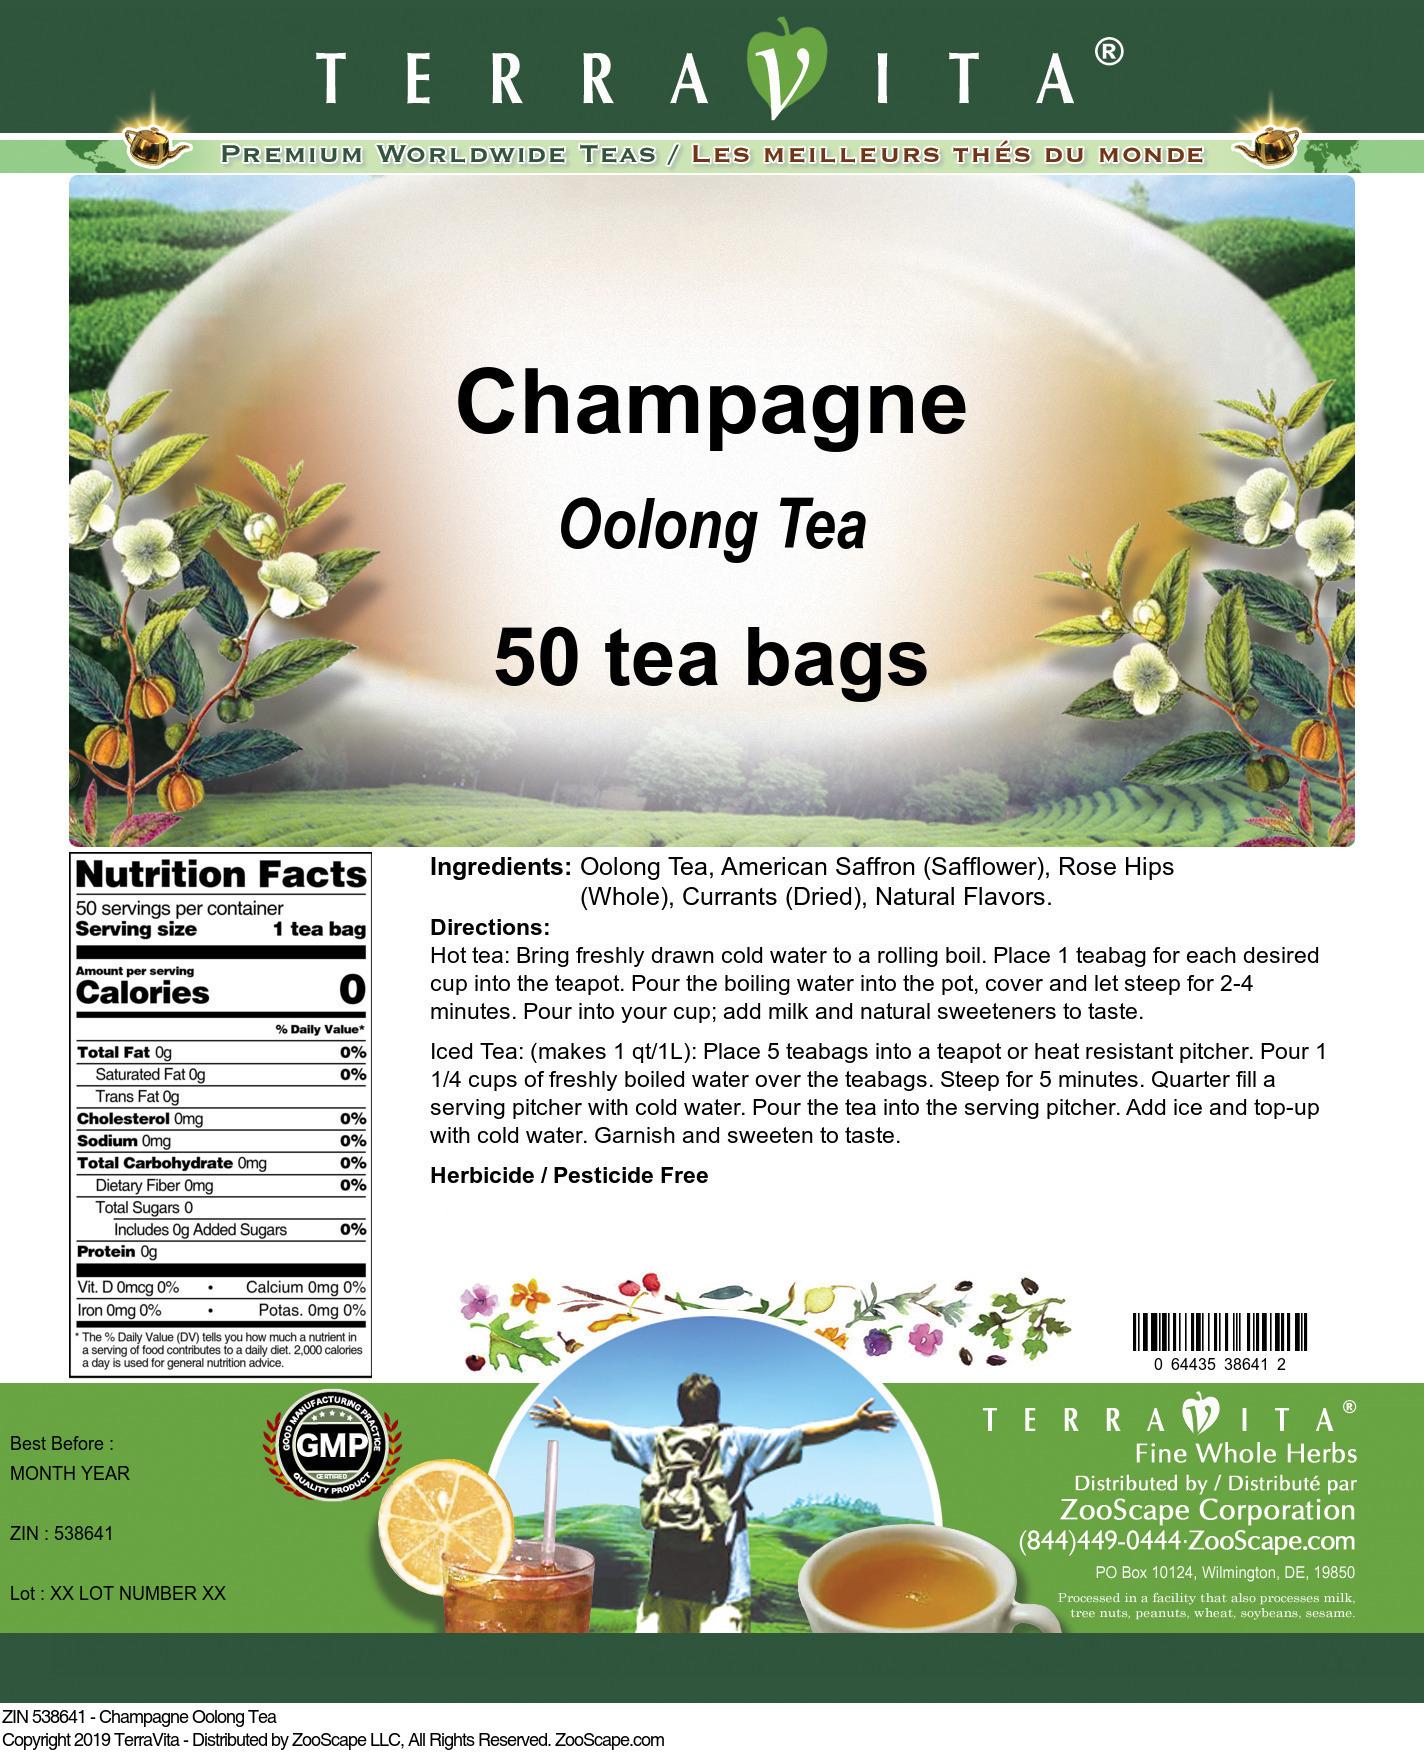 Champagne Oolong Tea